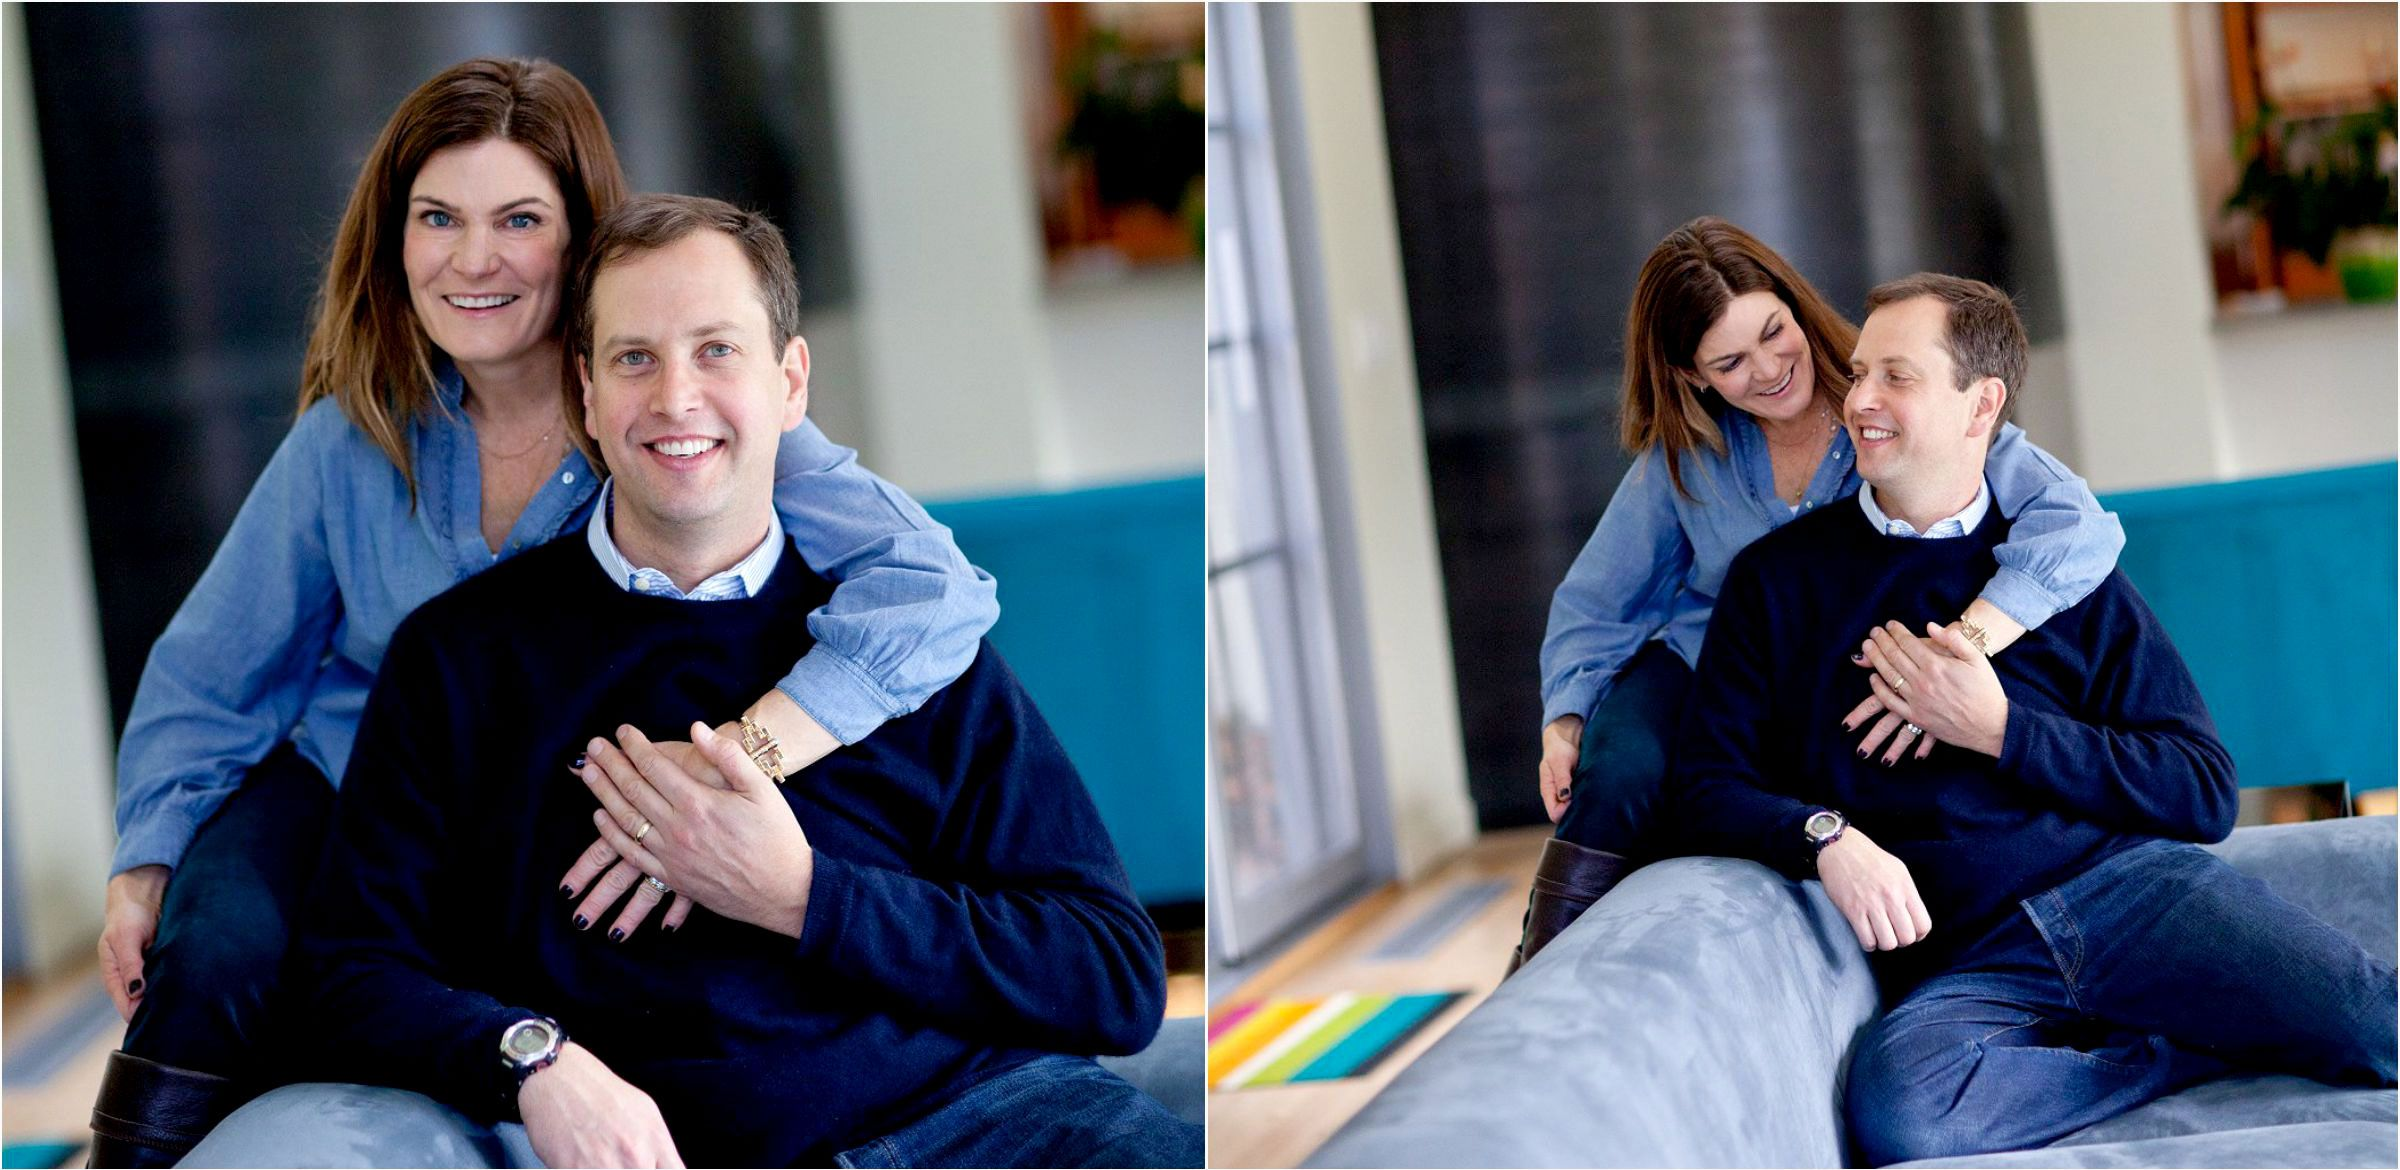 couple-portrait-session-in-denver-home-003